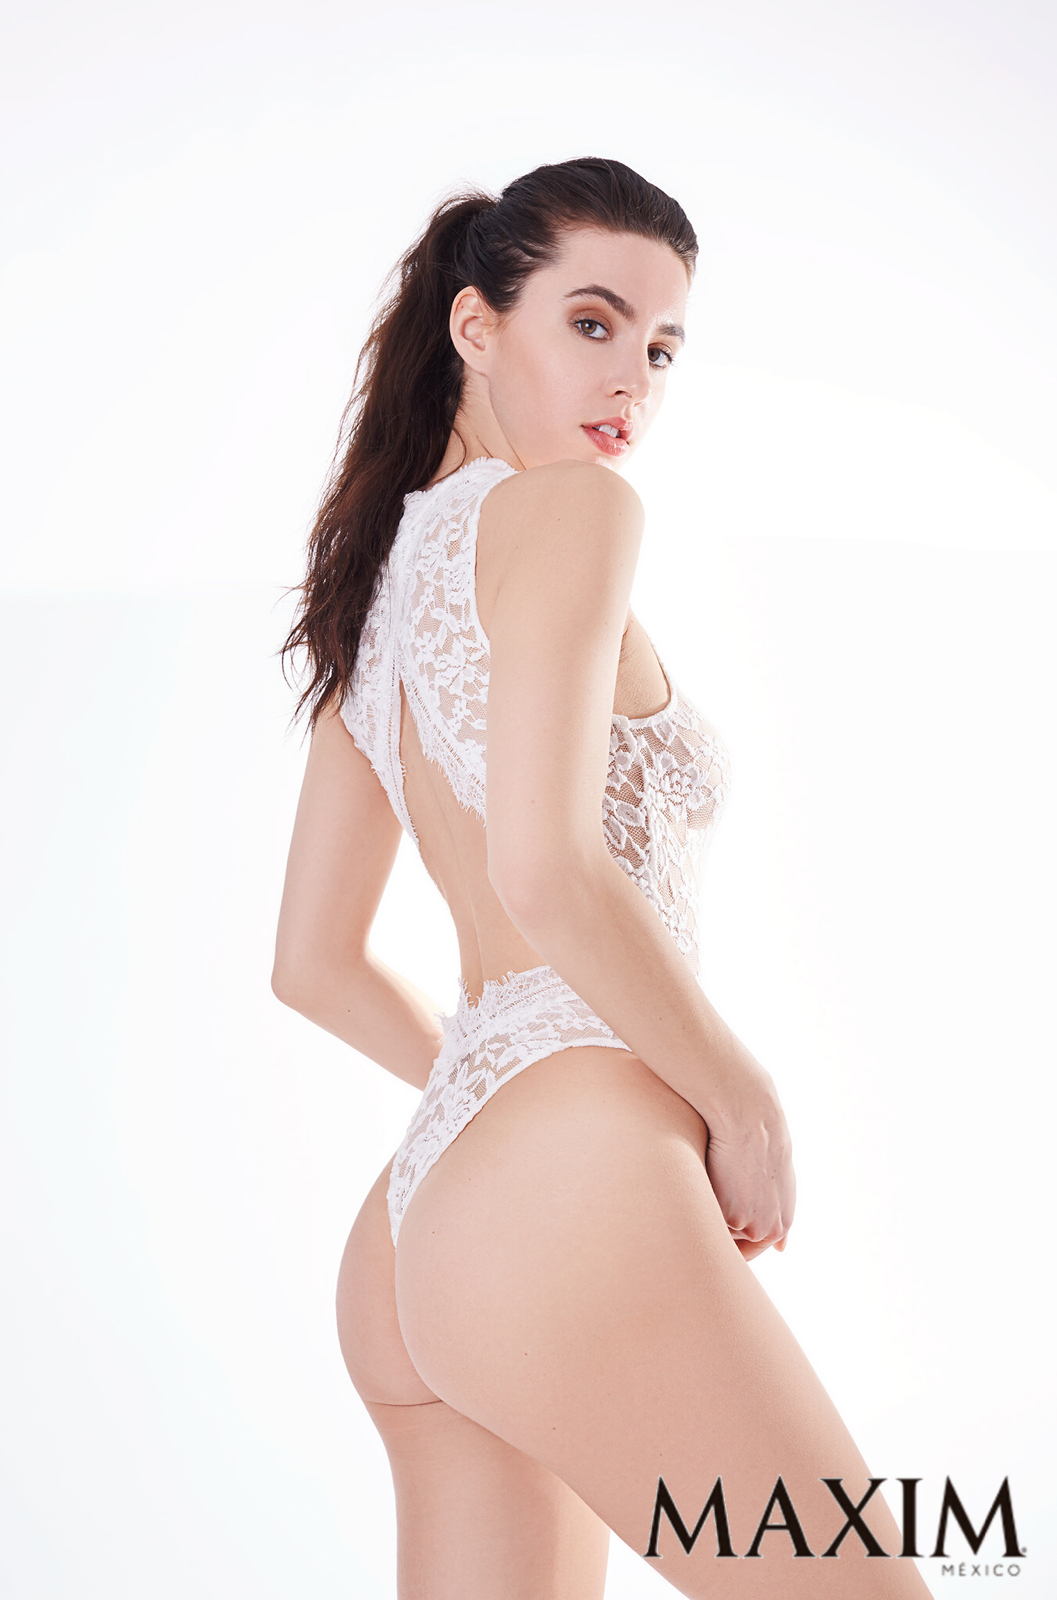 Maxim Mexico - June 2018